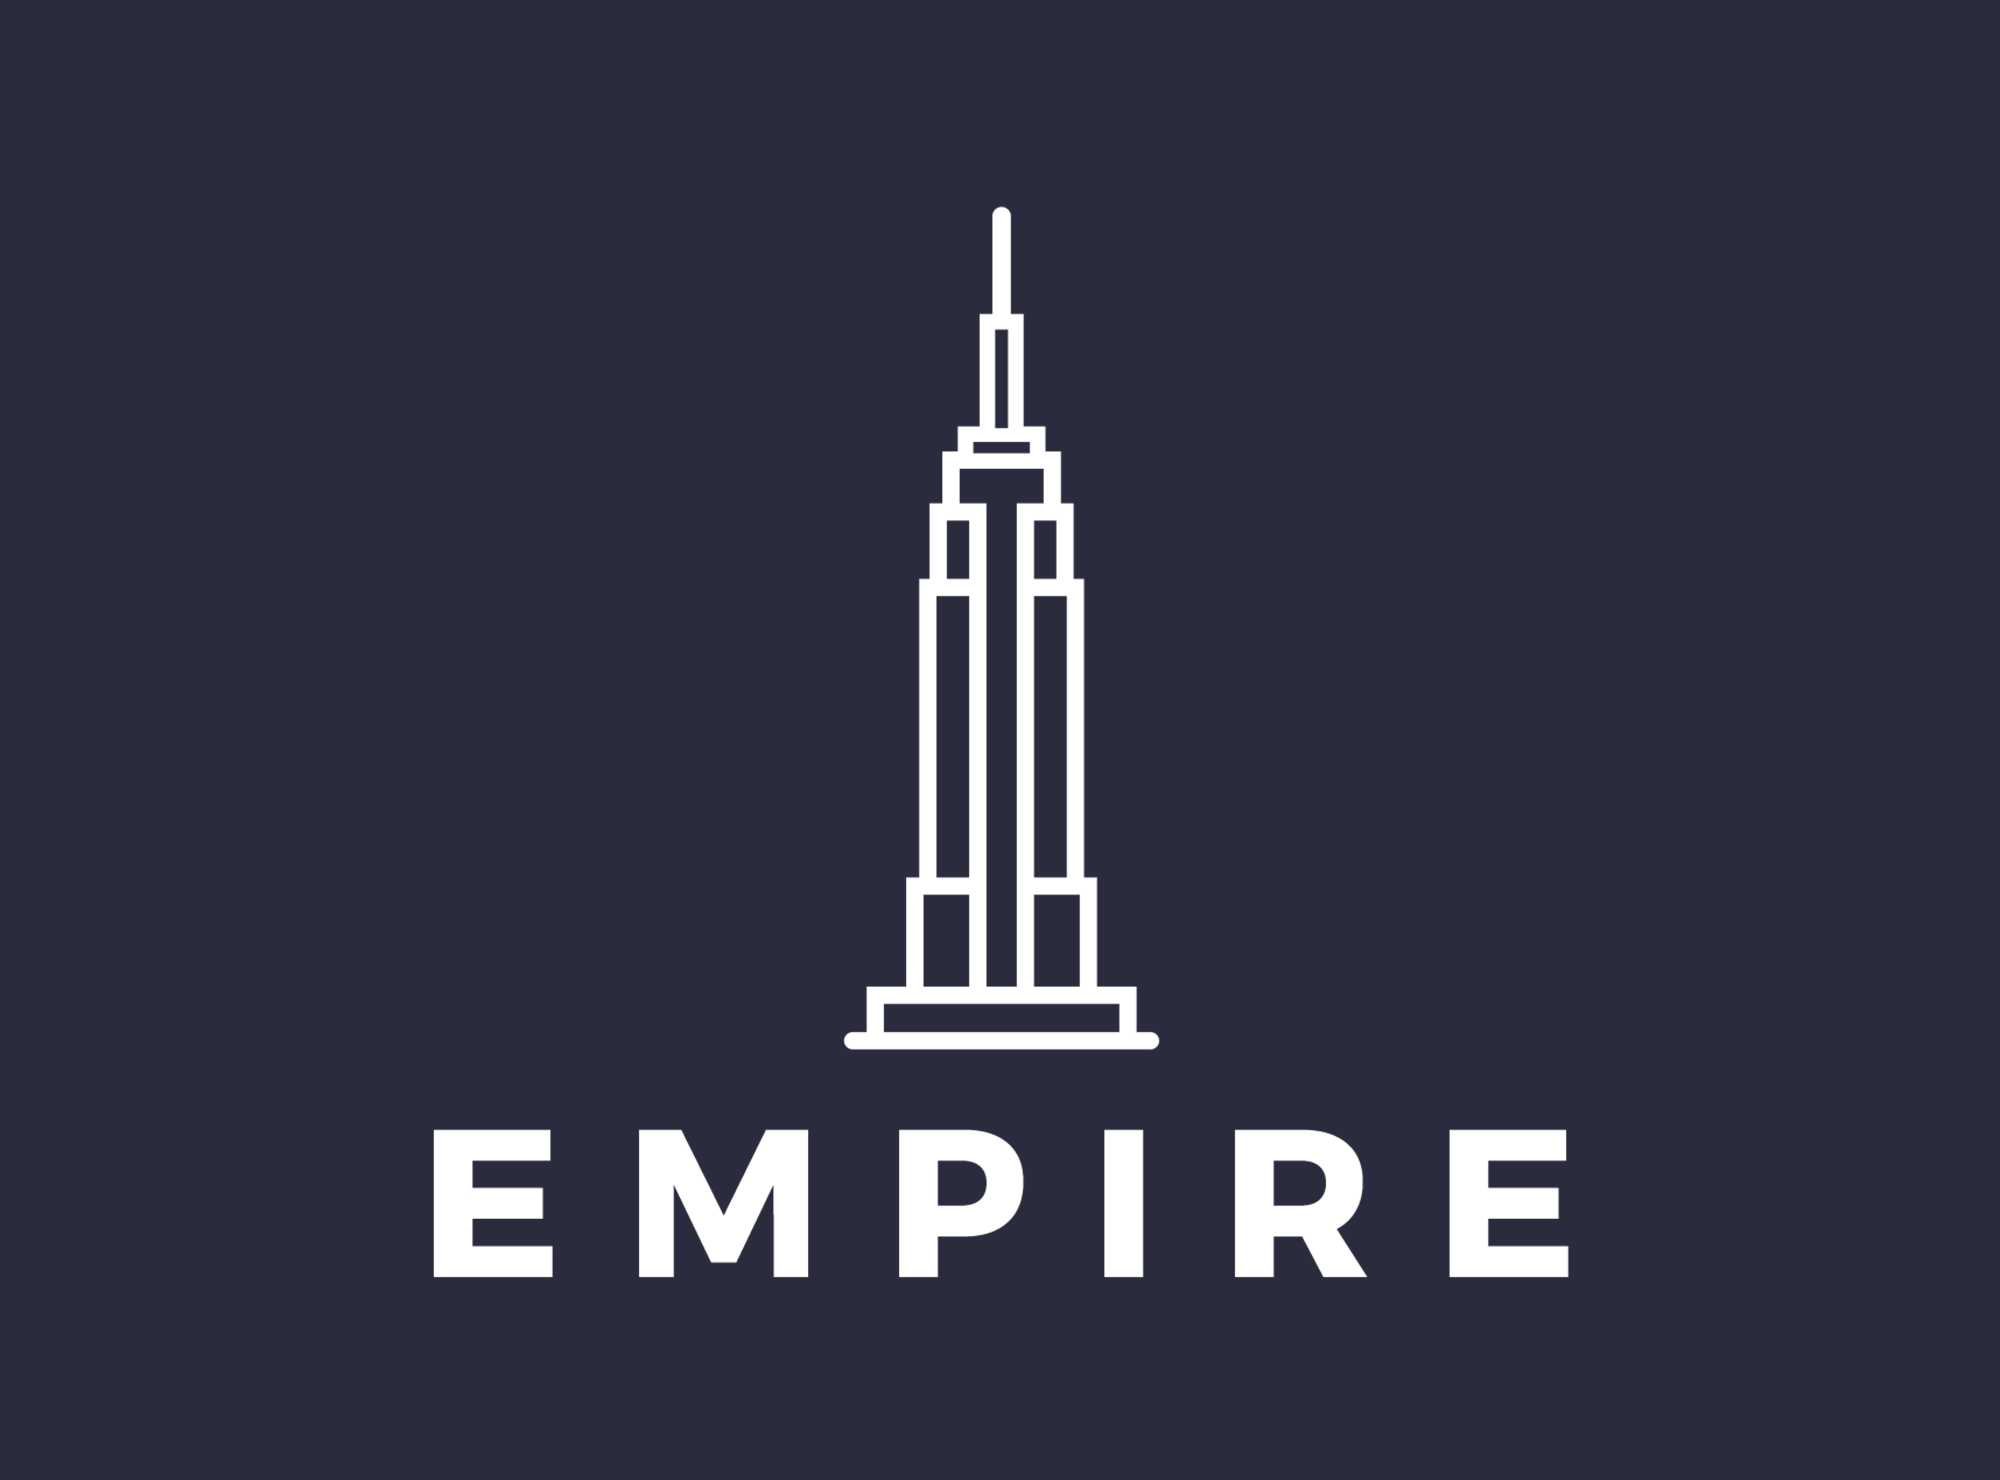 EMPIRE mask logo